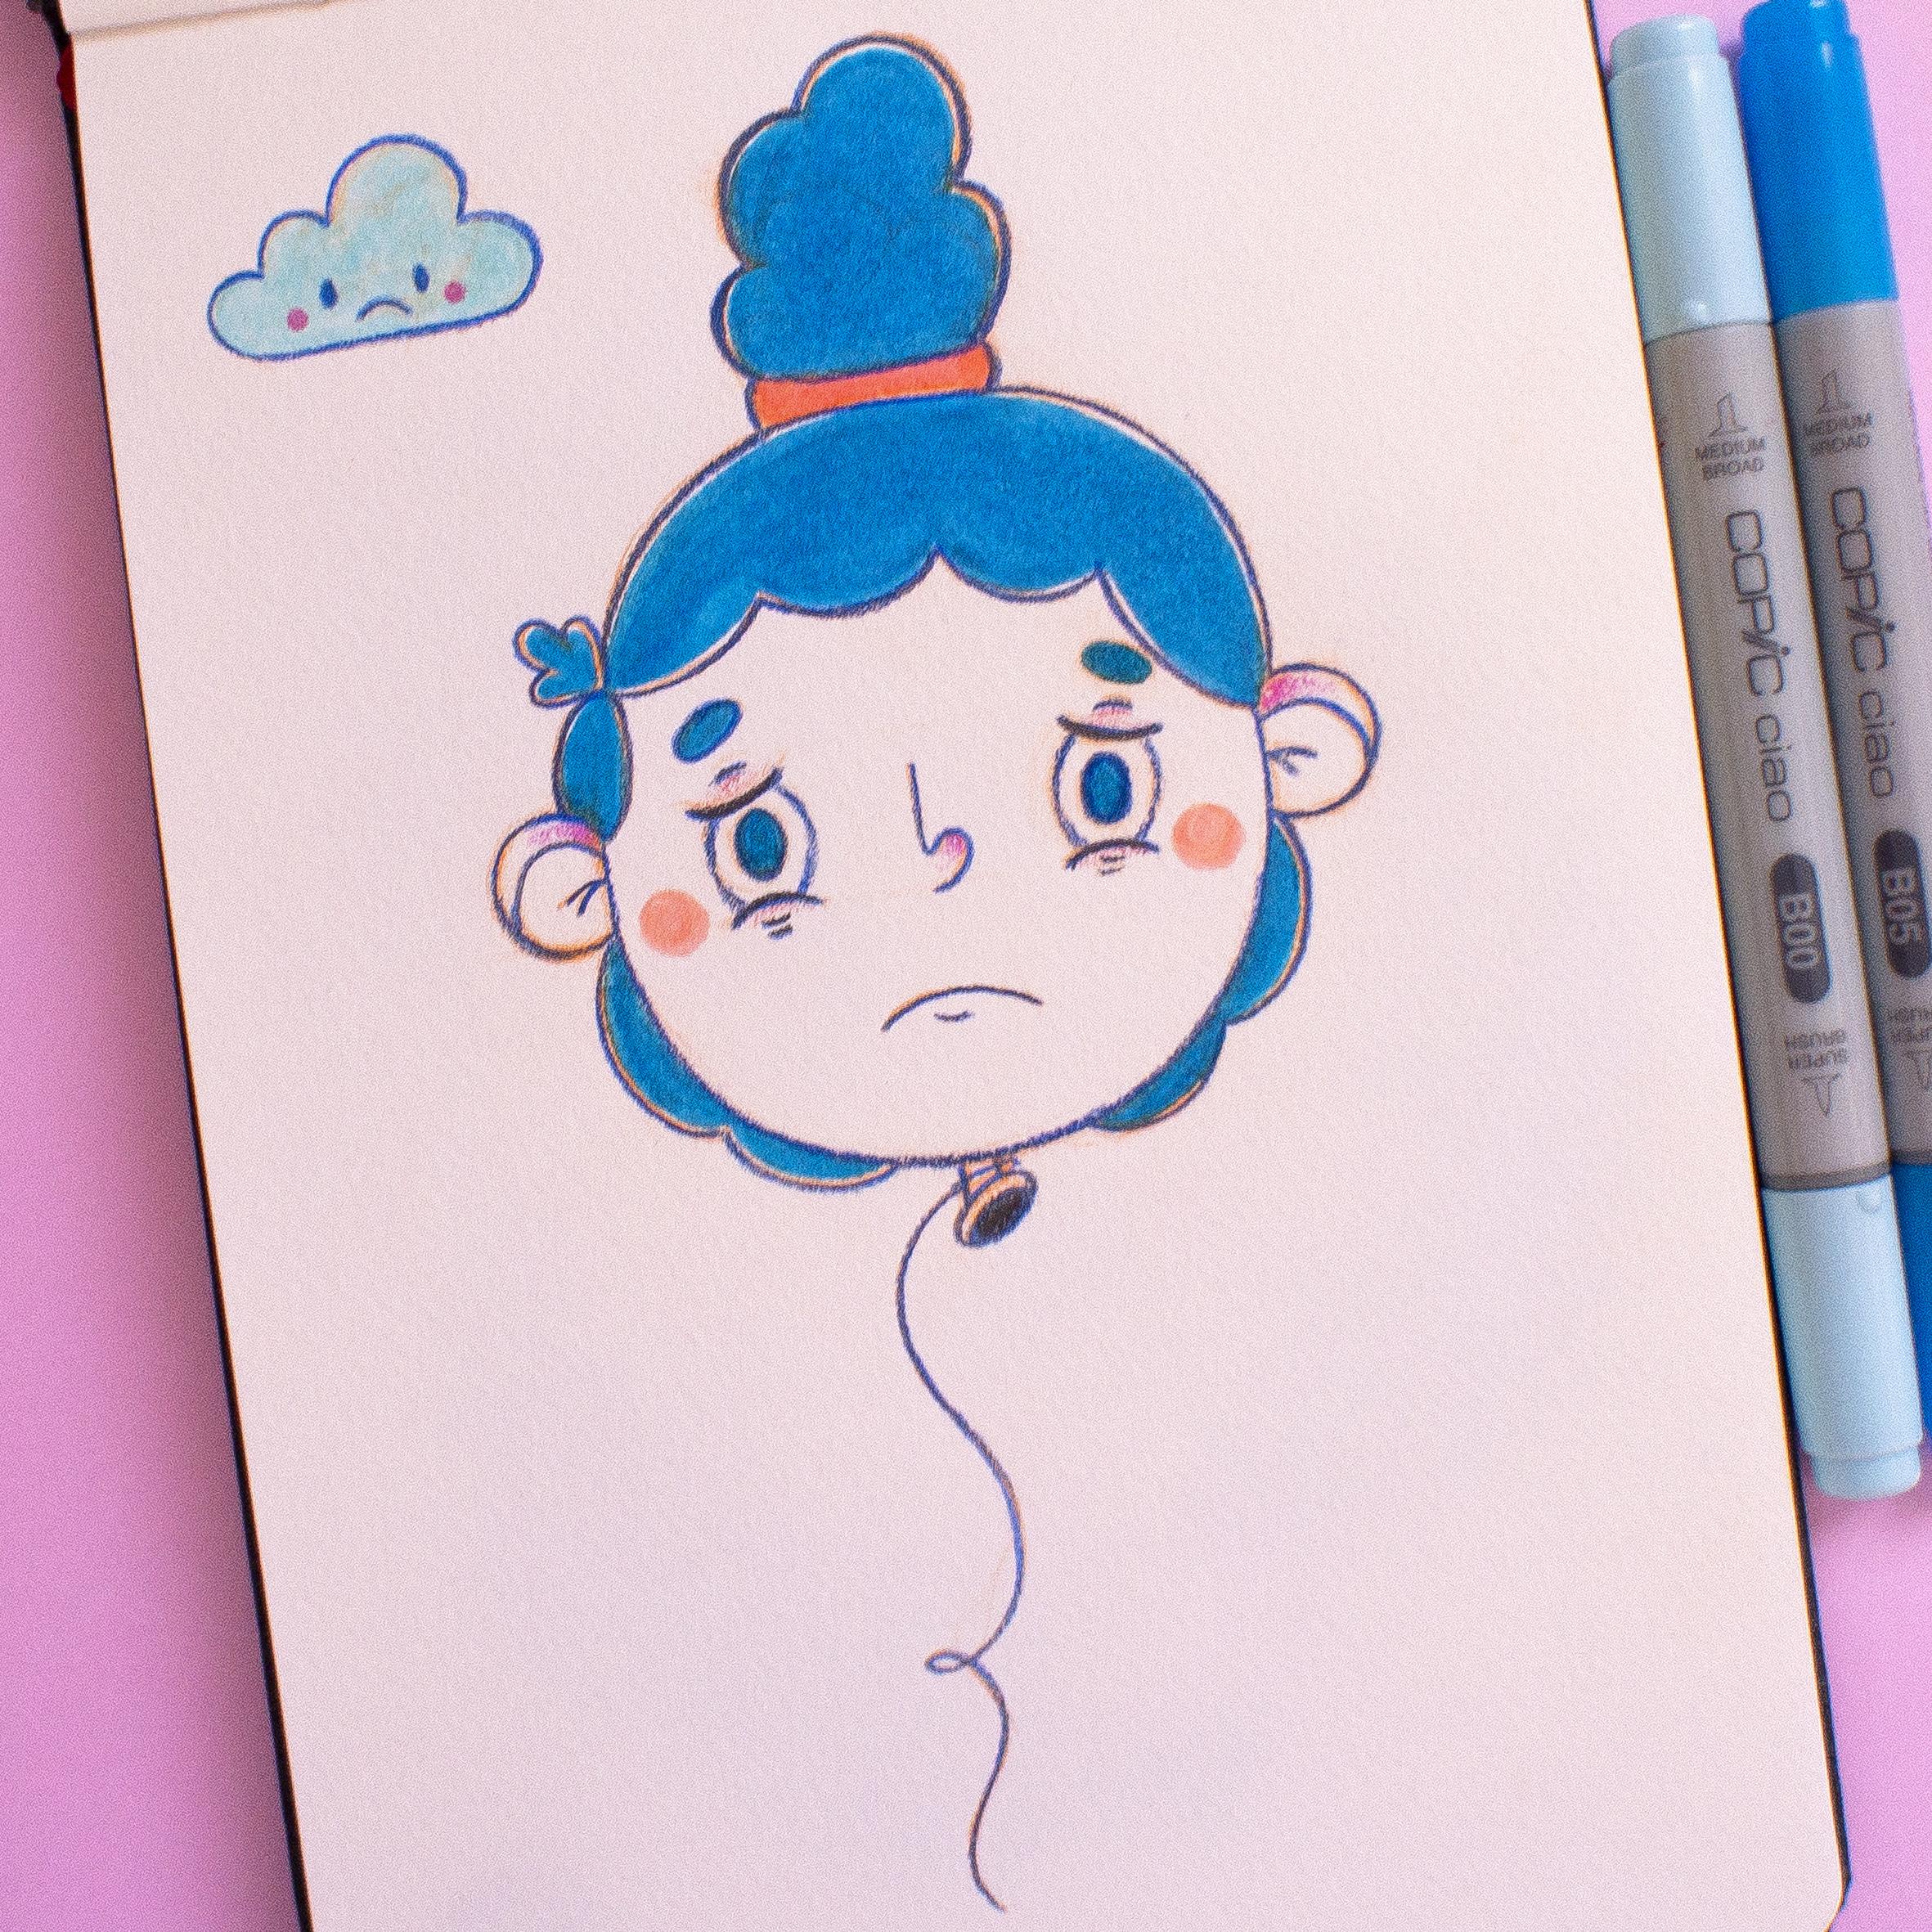 Day 7 - Sad